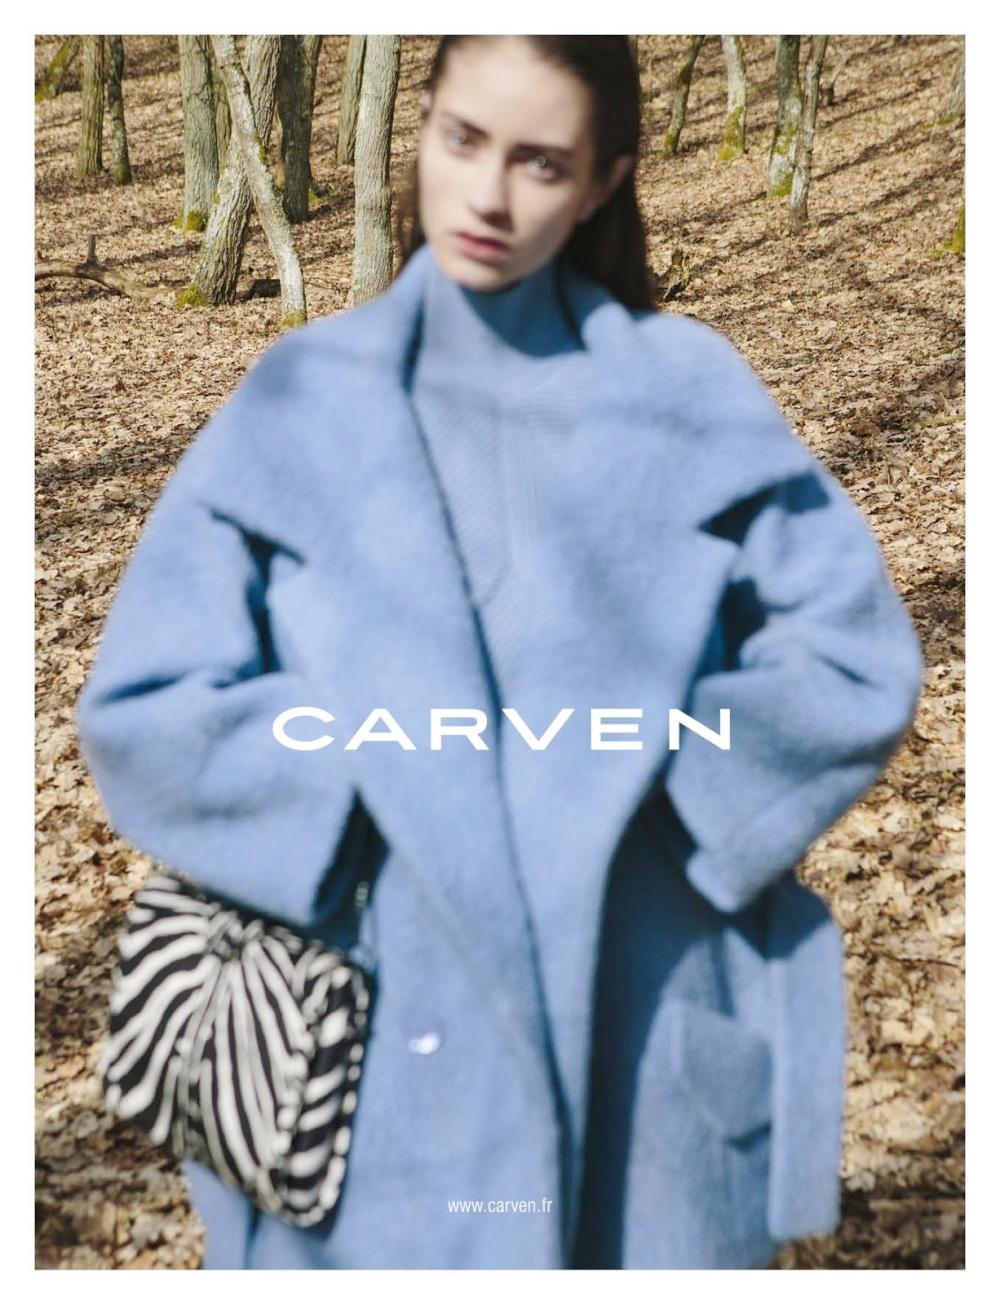 Carven Hiver 13 #5 BD